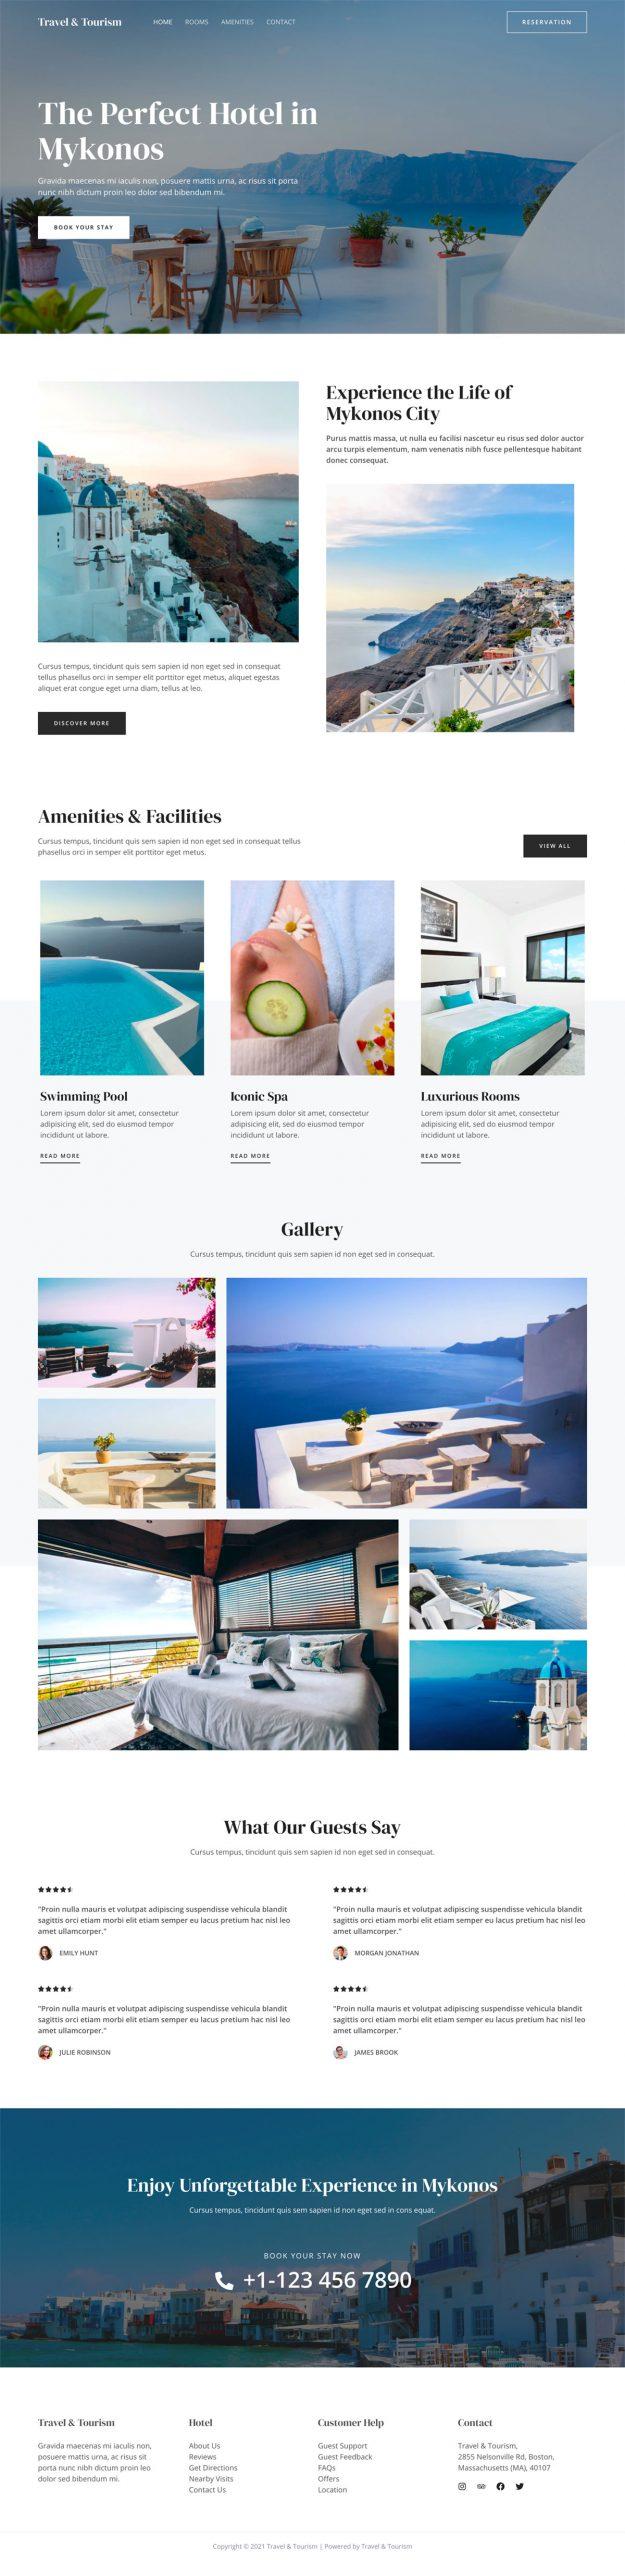 Travel website design example